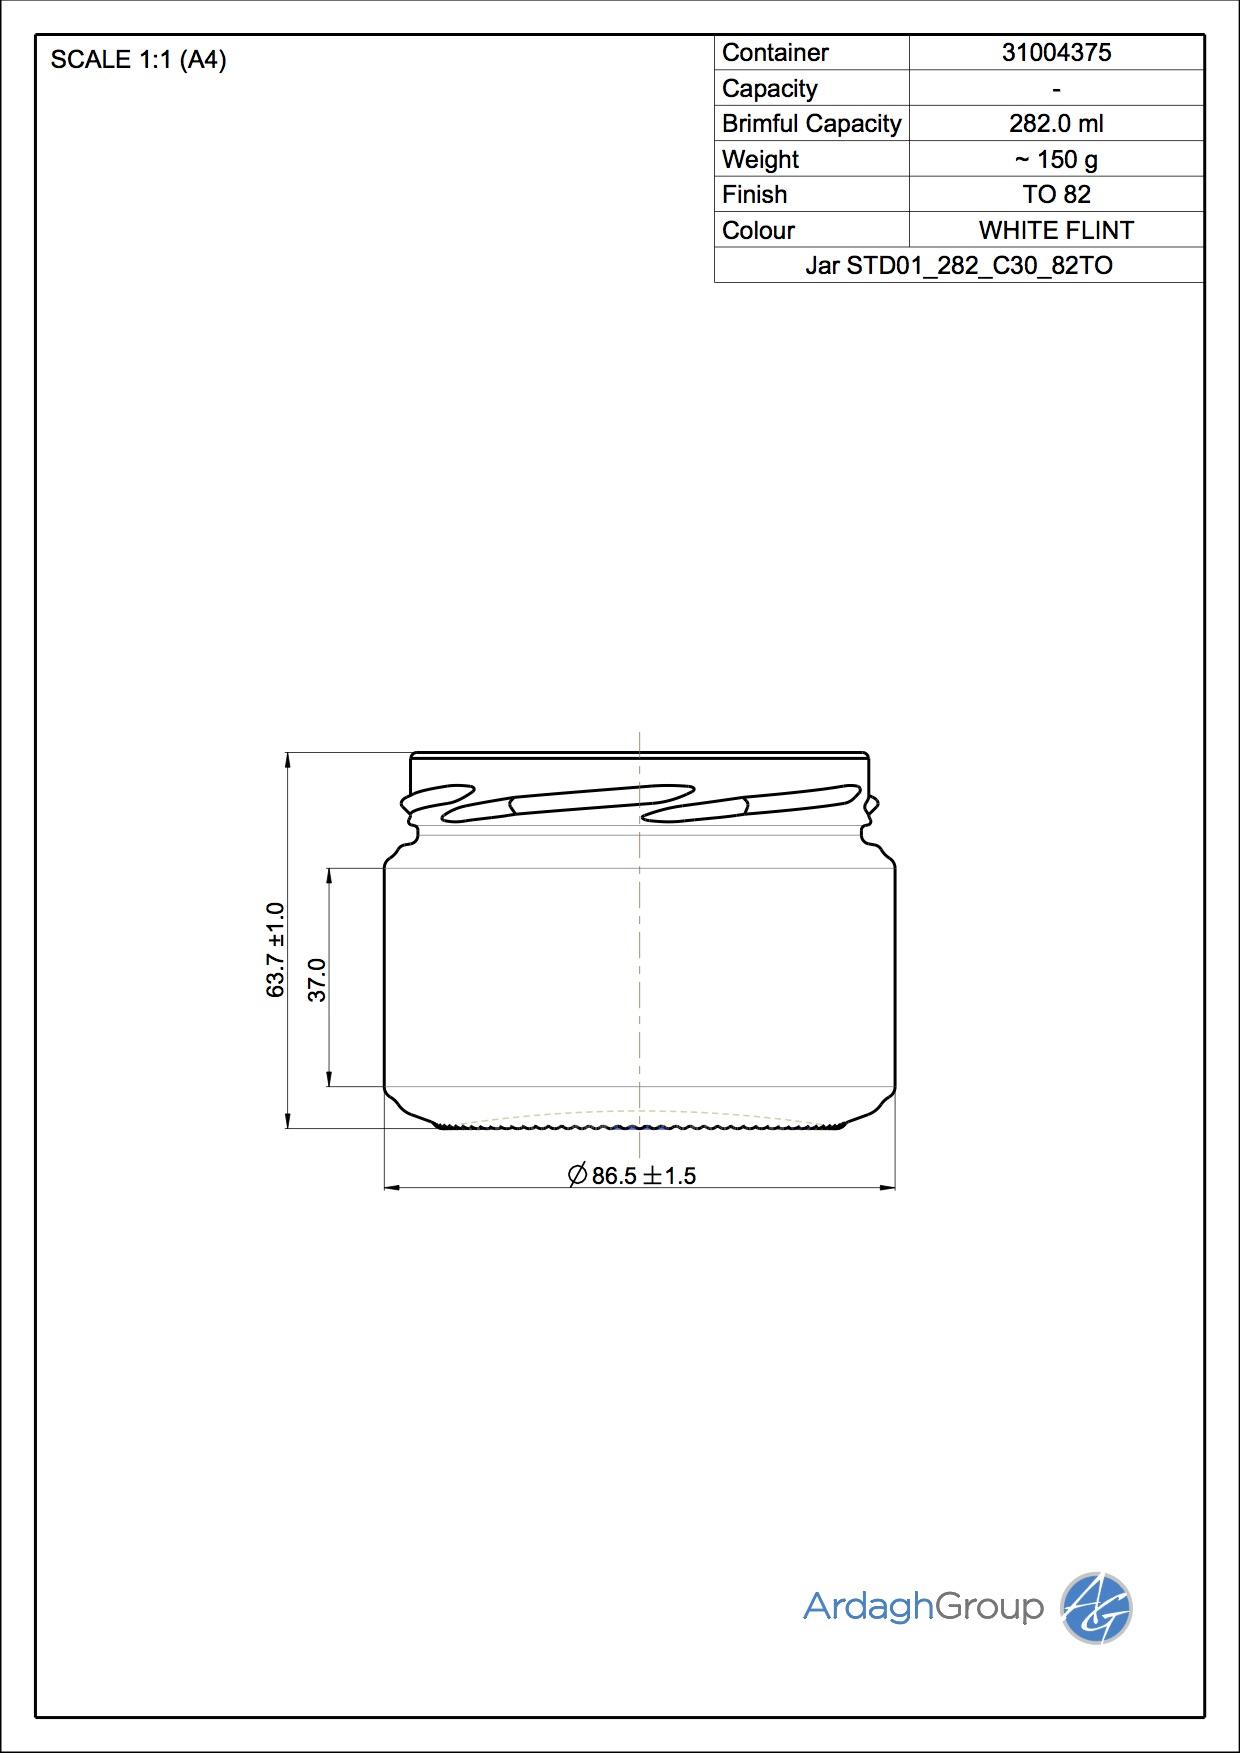 Jar STD01 282 C30 82TO